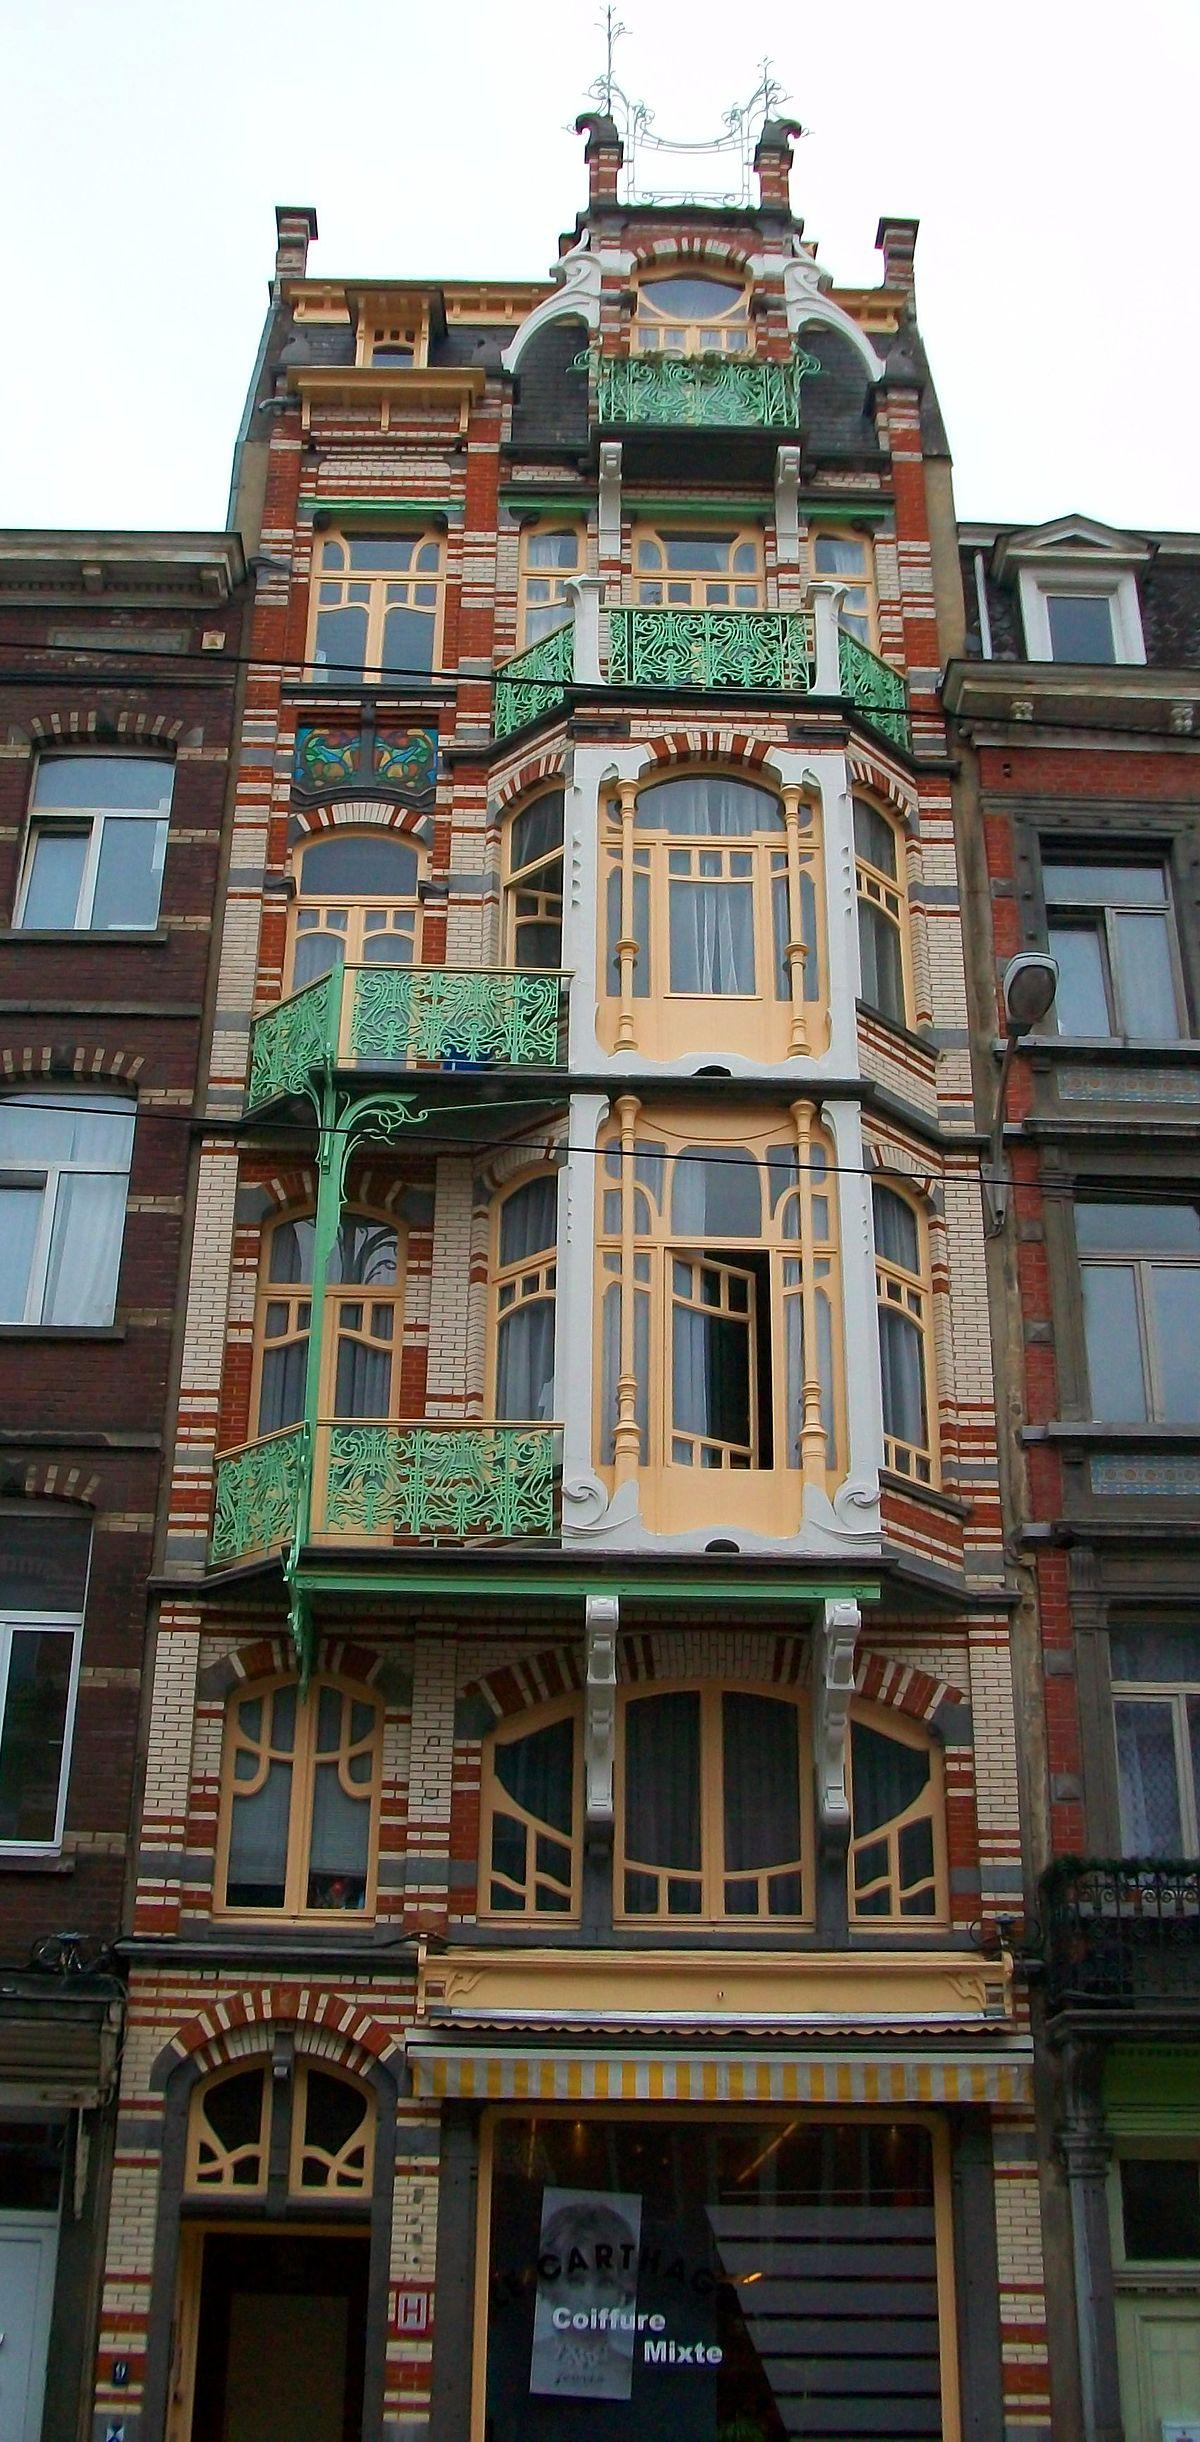 immeuble de beck  u2014 wikip u00e9dia